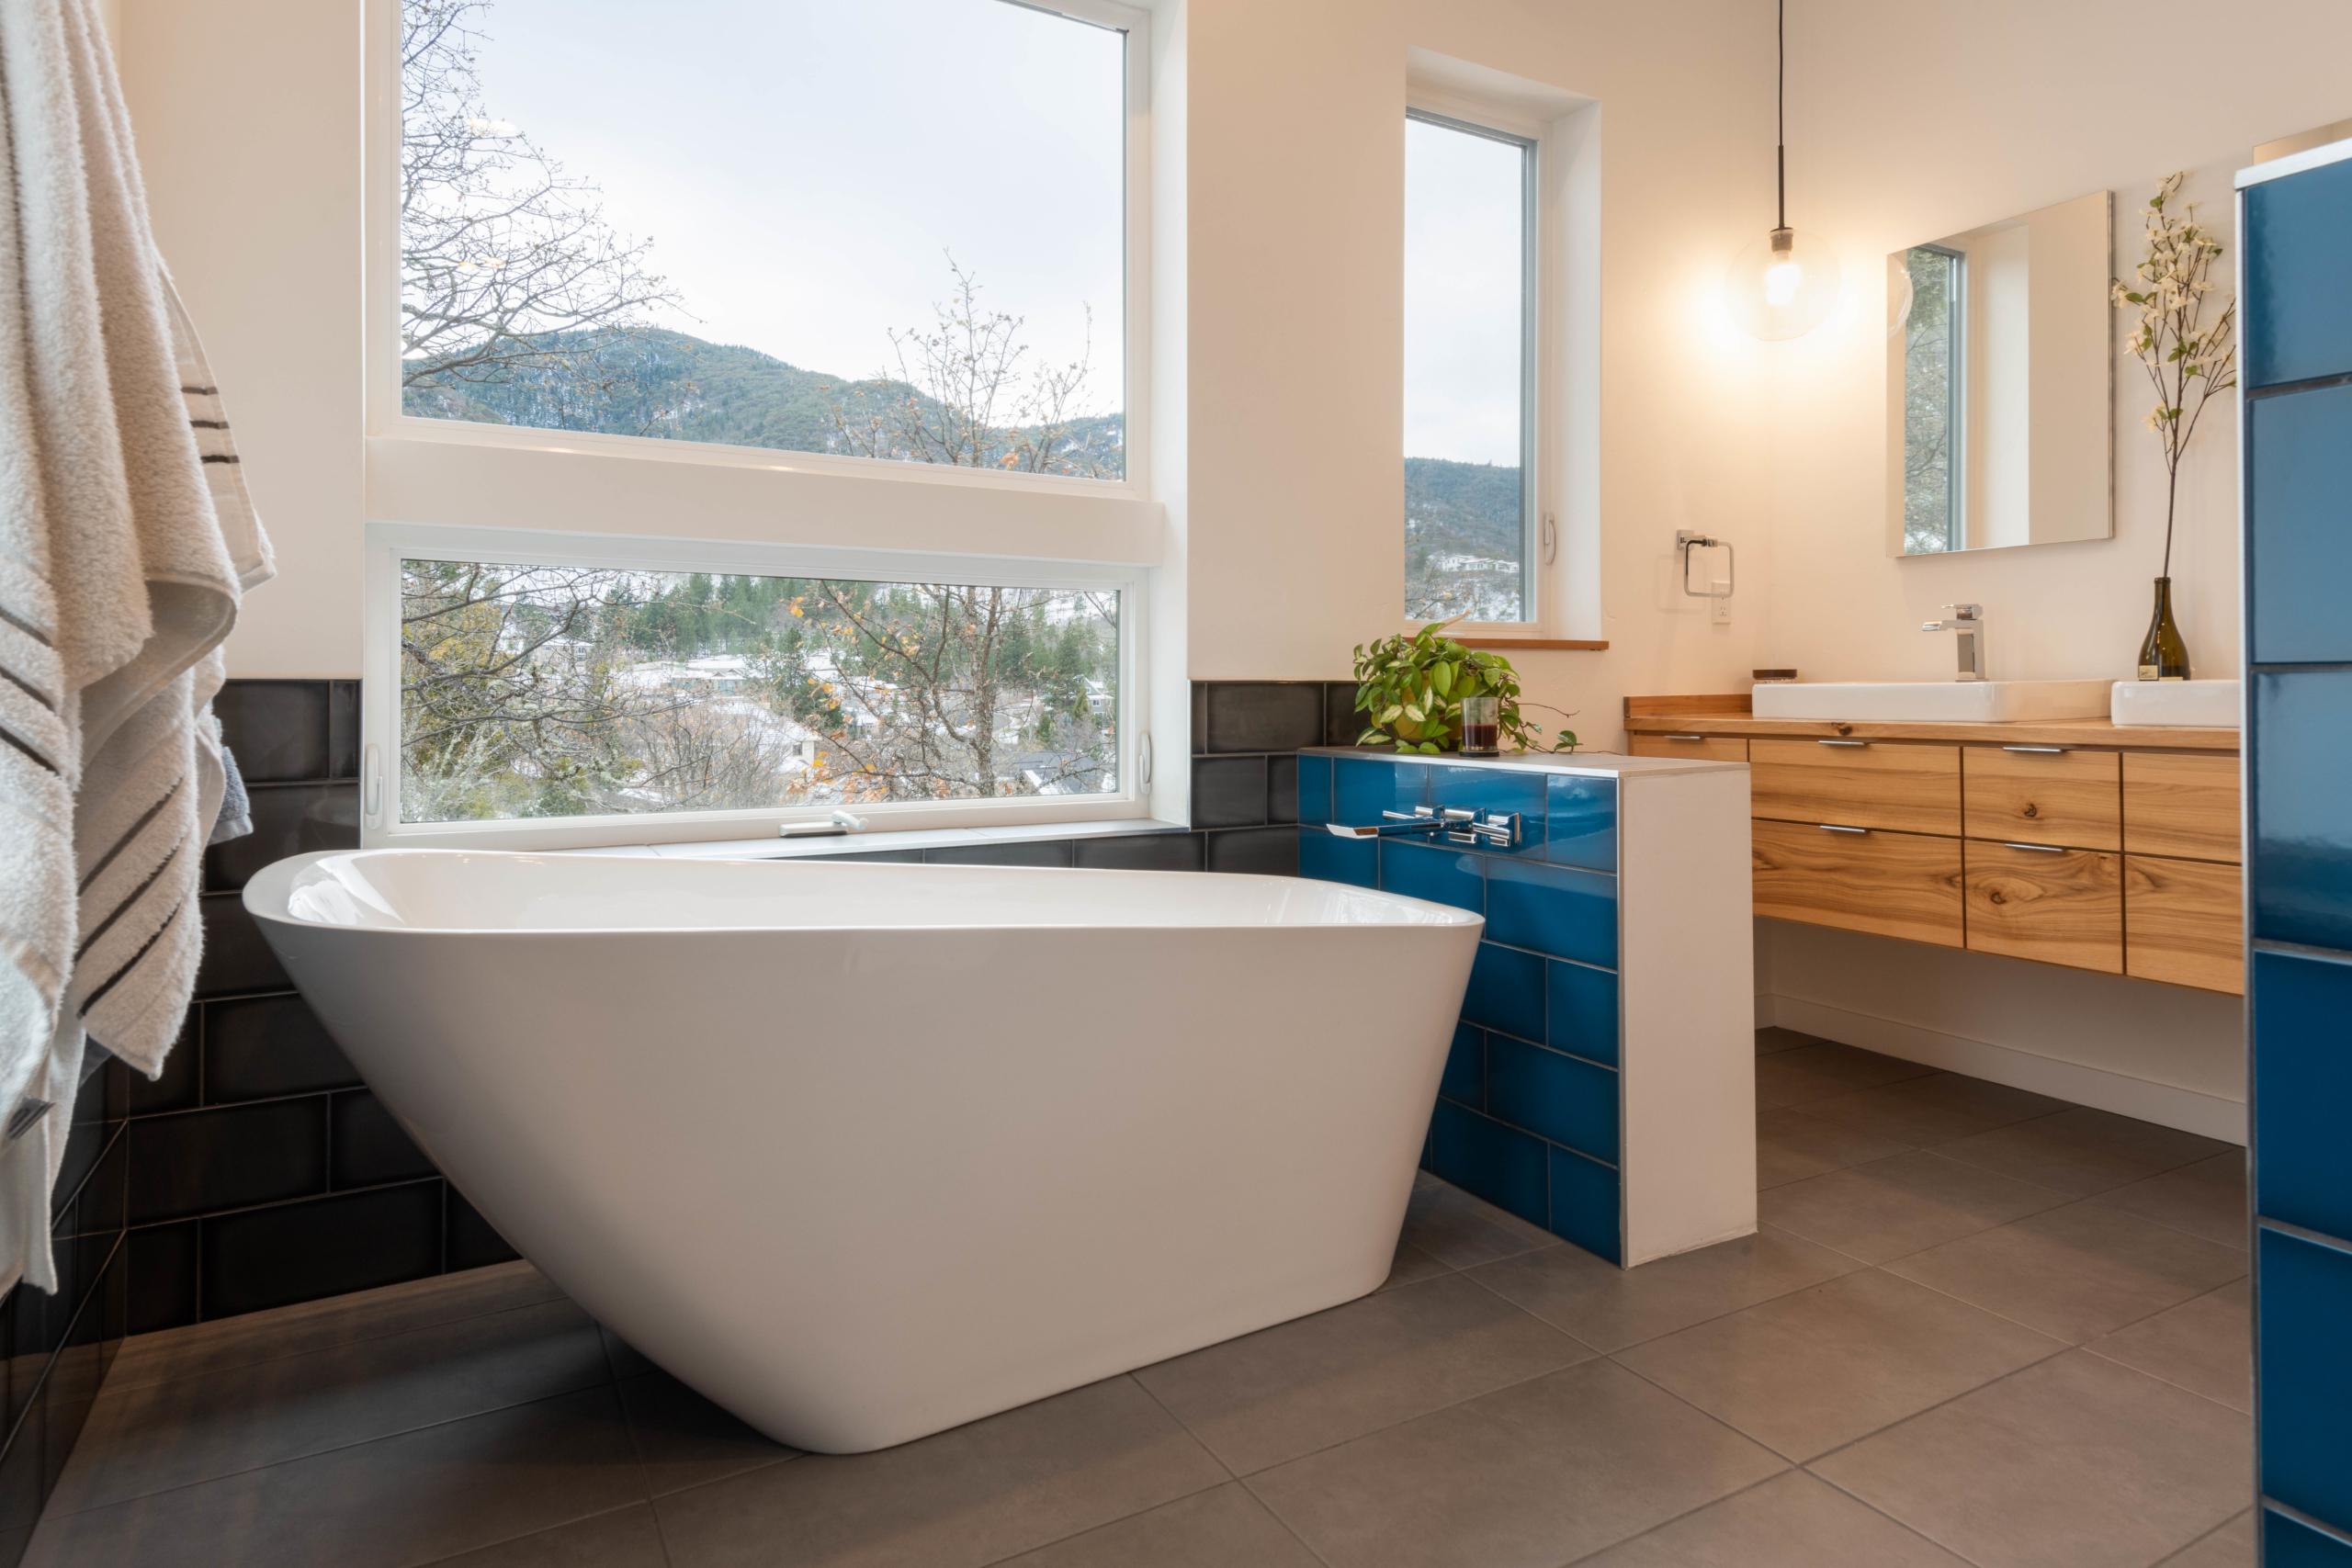 Delgado Architect Ashland Blue Tiled Bathroom